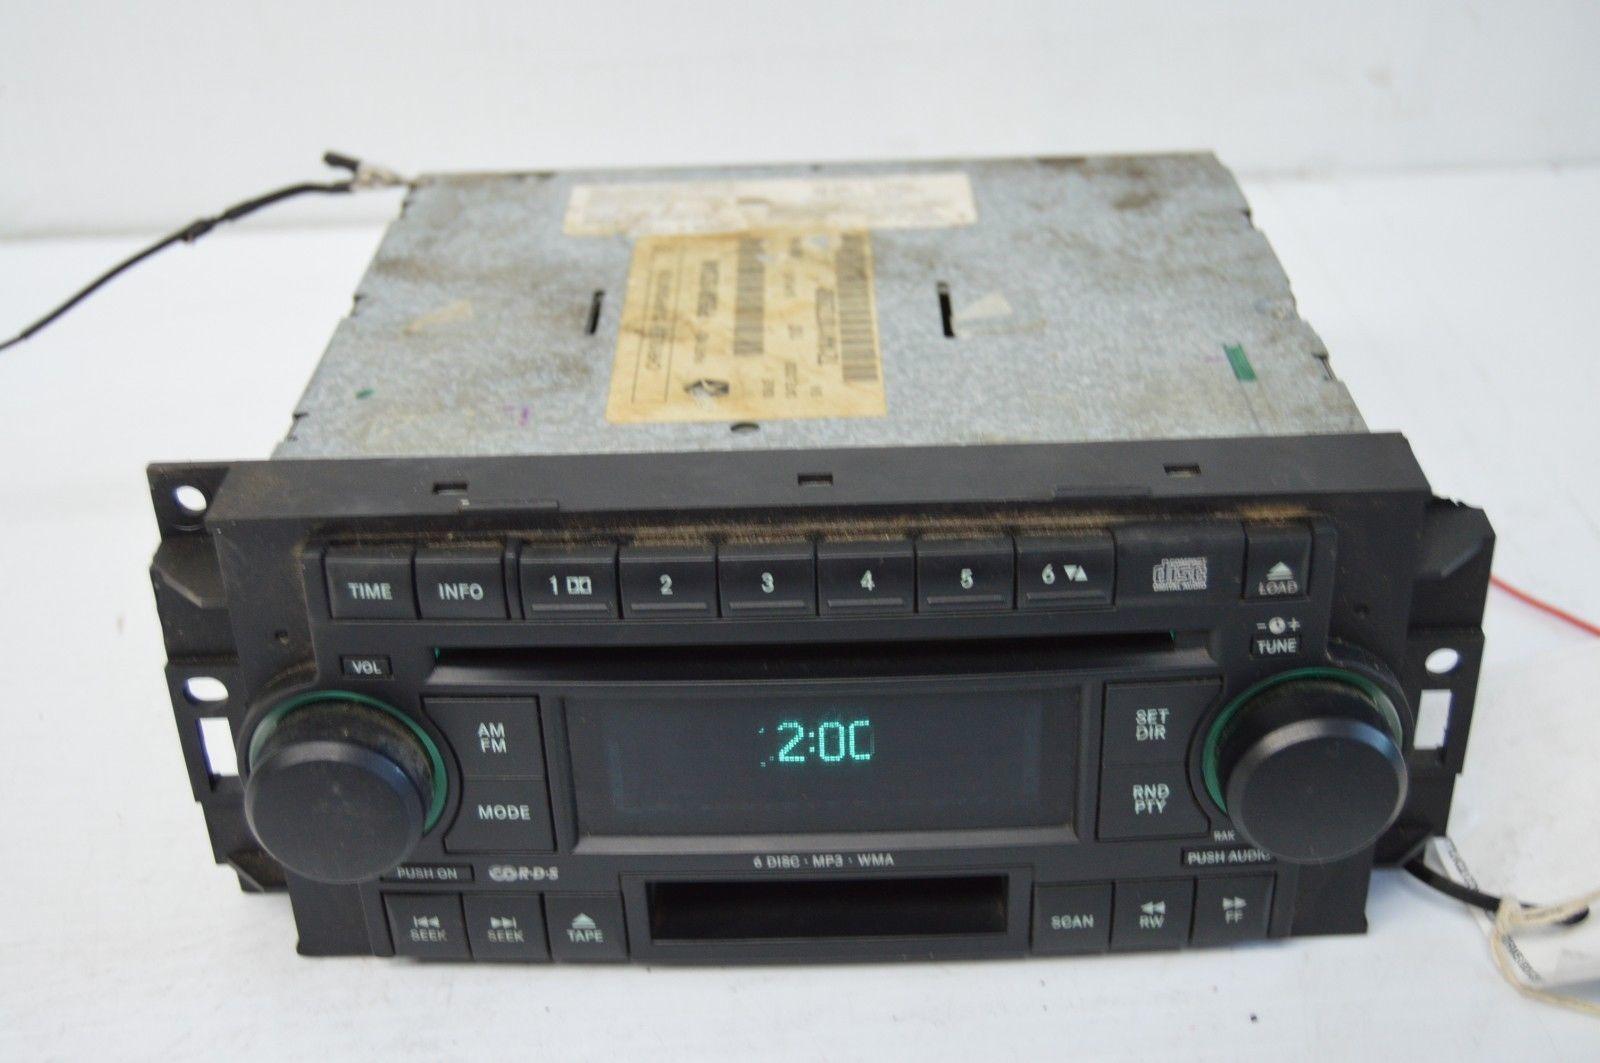 2005-2010 CHRYSLER 300 RADIO CD PLAYER OEM RADIO P05091523AN TESTED F57#019